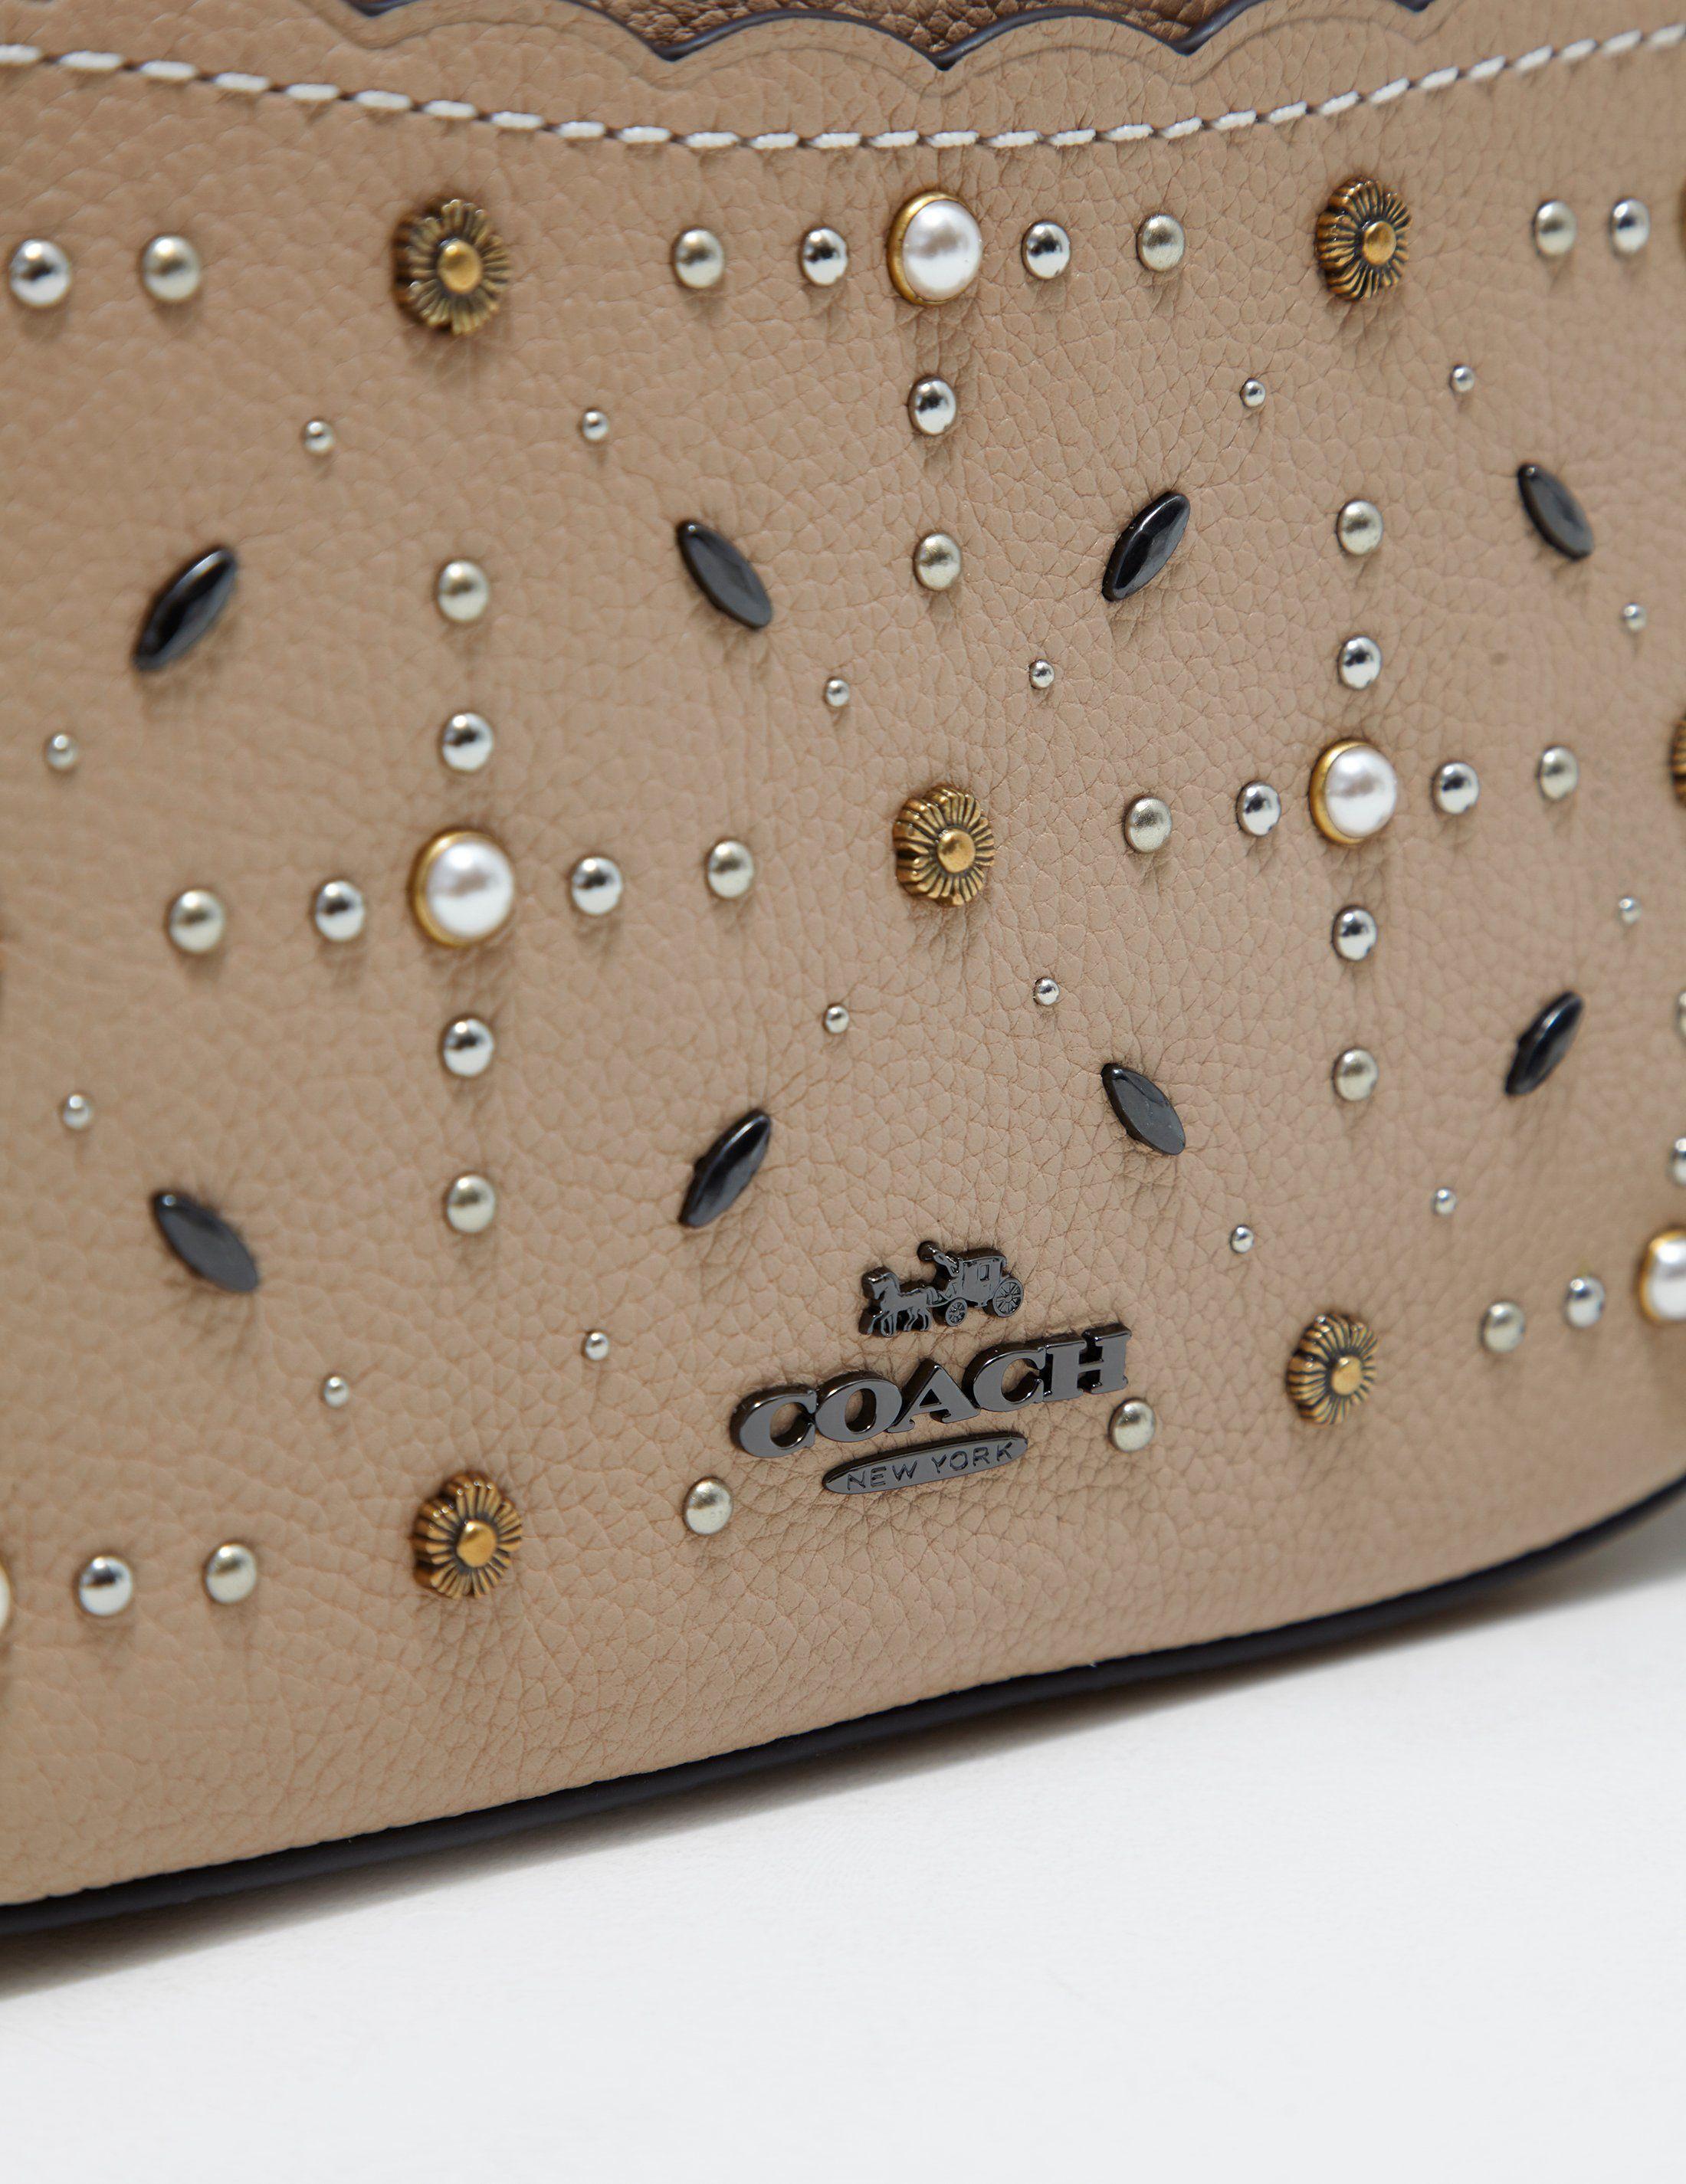 COACH Prairie Rivet Camera Bag